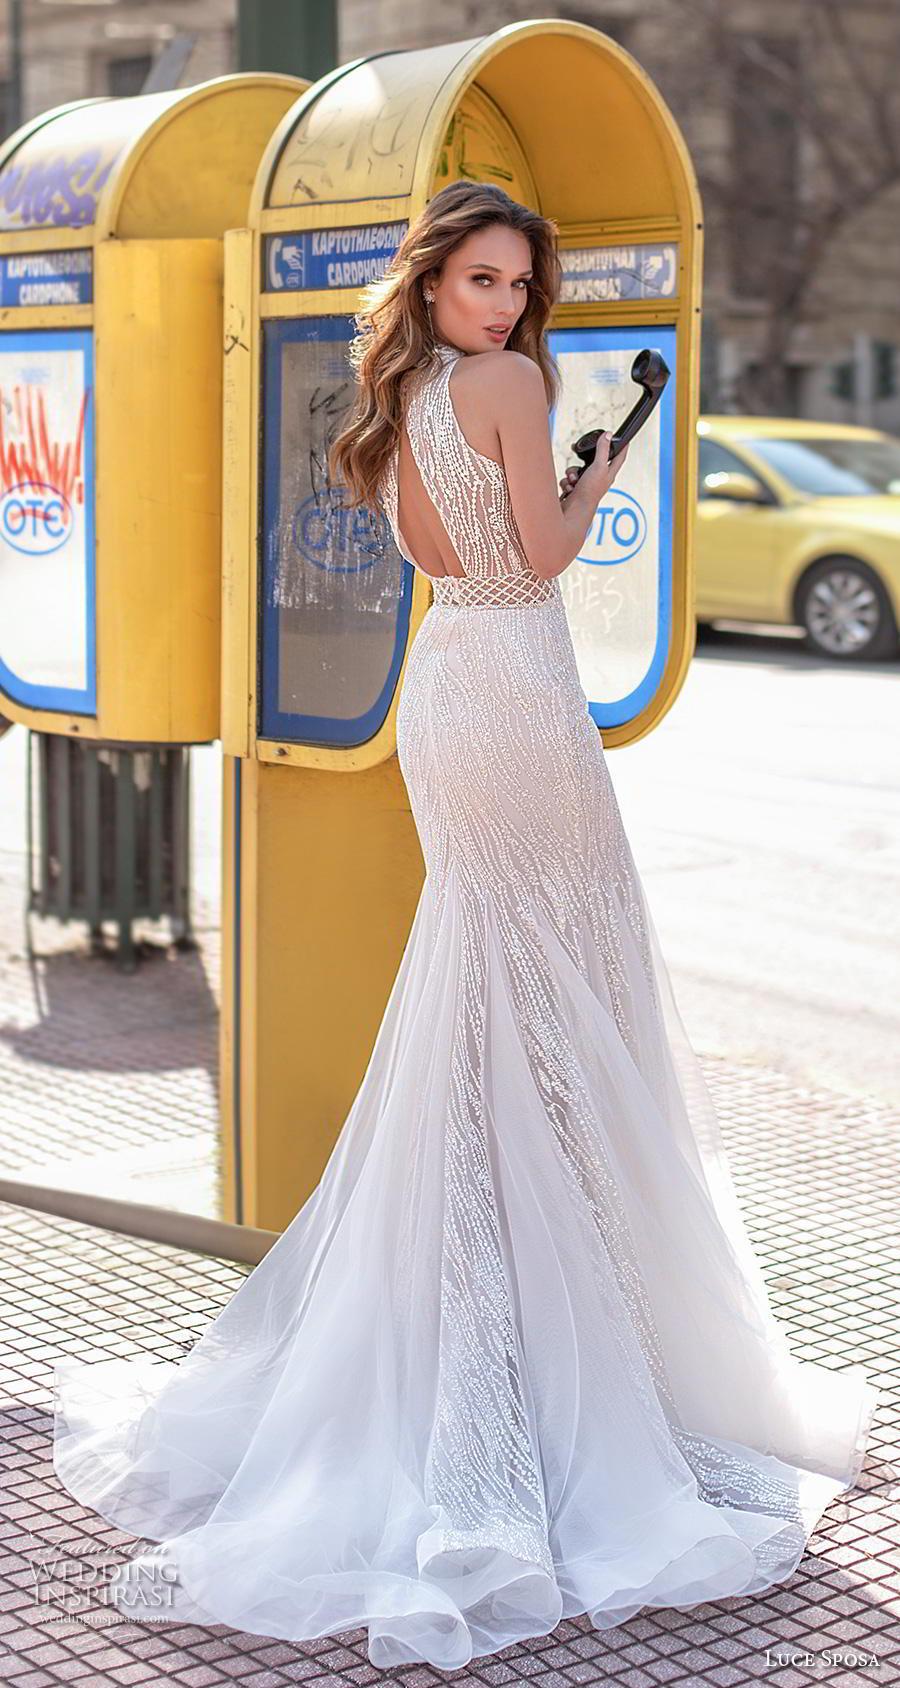 luce sposa 2020 bridal cold shoulder hanging sleeves high neck keyhole heavily embellished bodice sexy elegant fit and flare wedding dress keyhole back short train (12) bv